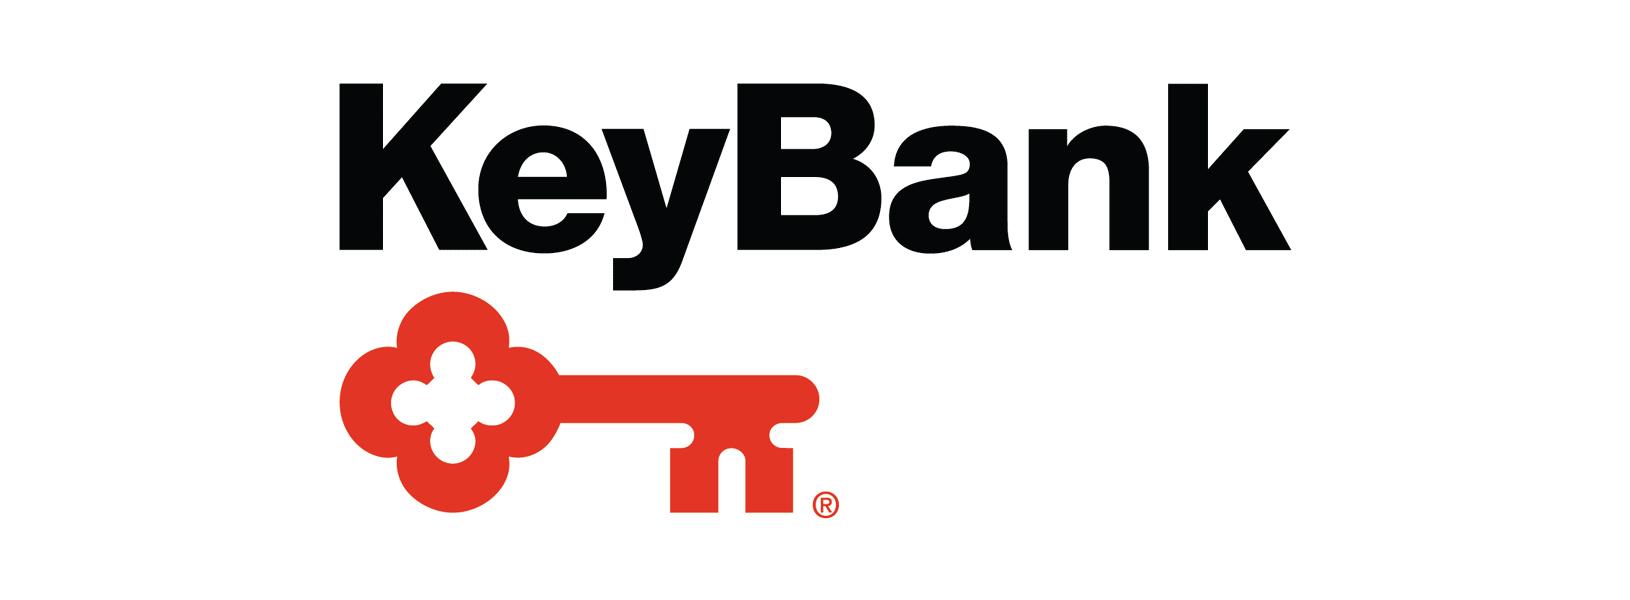 Keybank-Banner.jpg